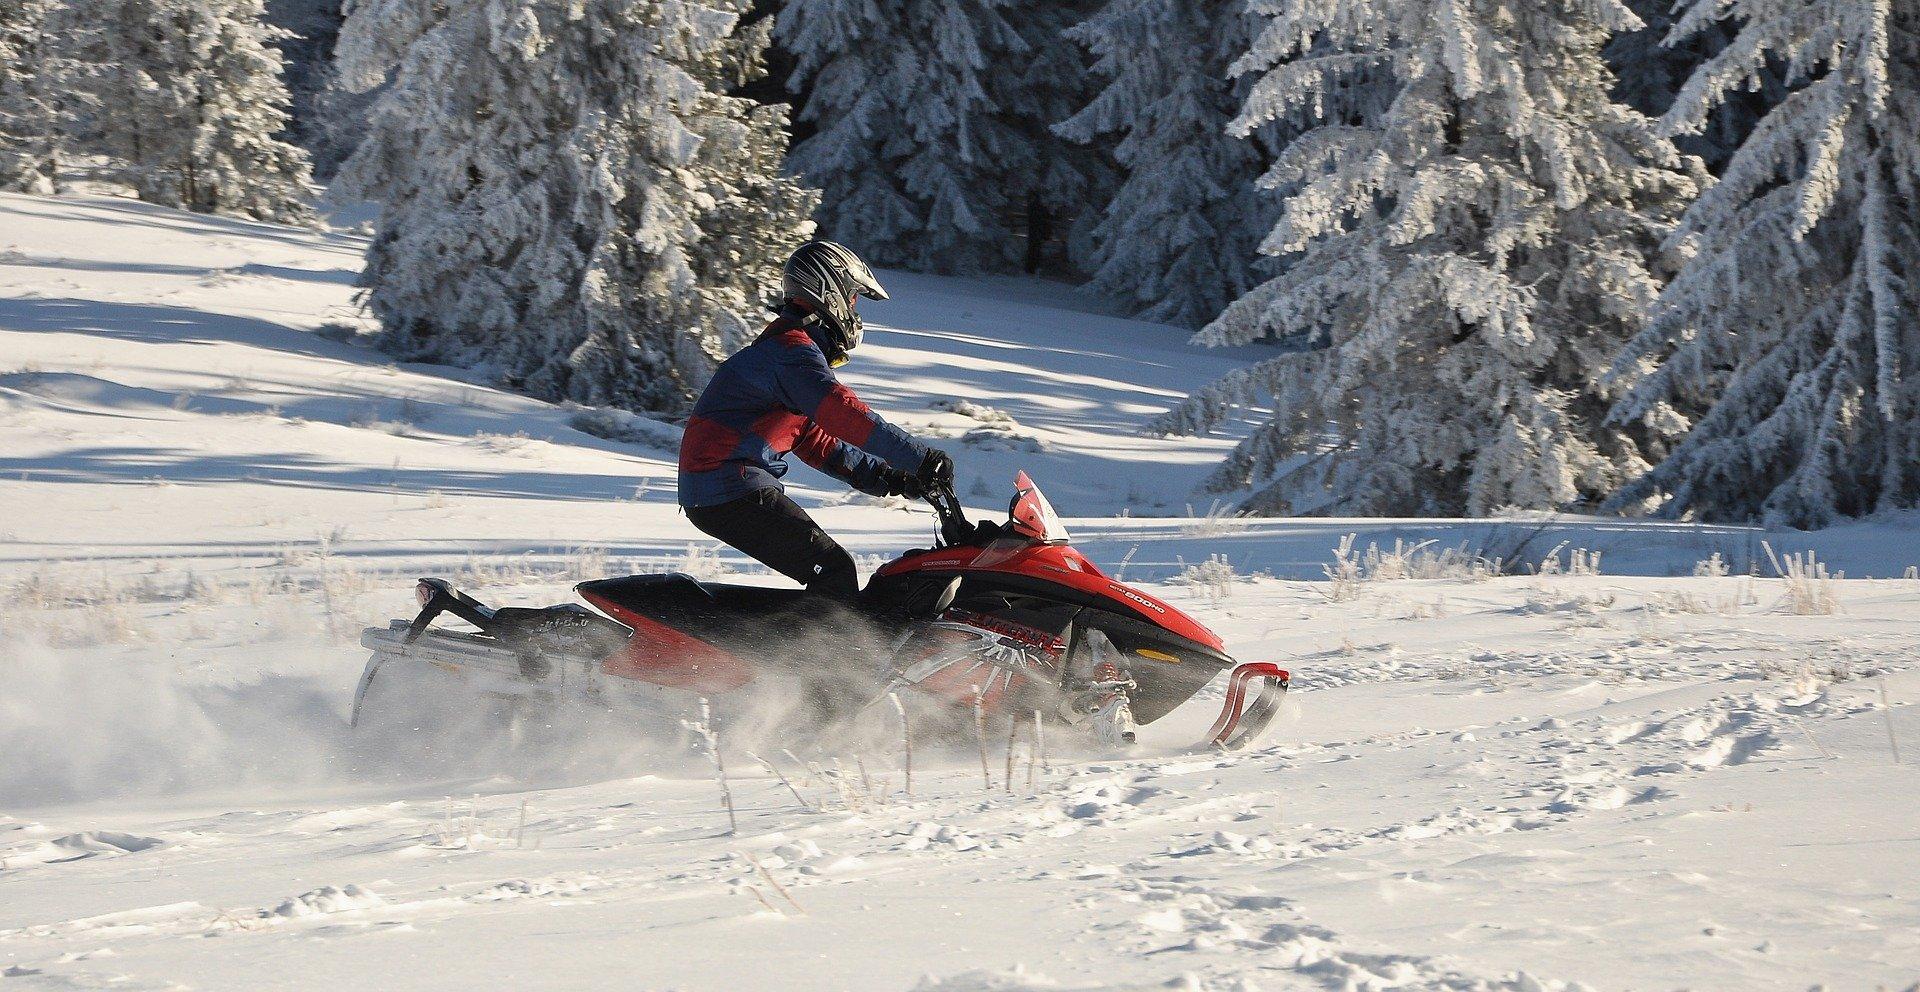 Person riding snowmobile in the winter